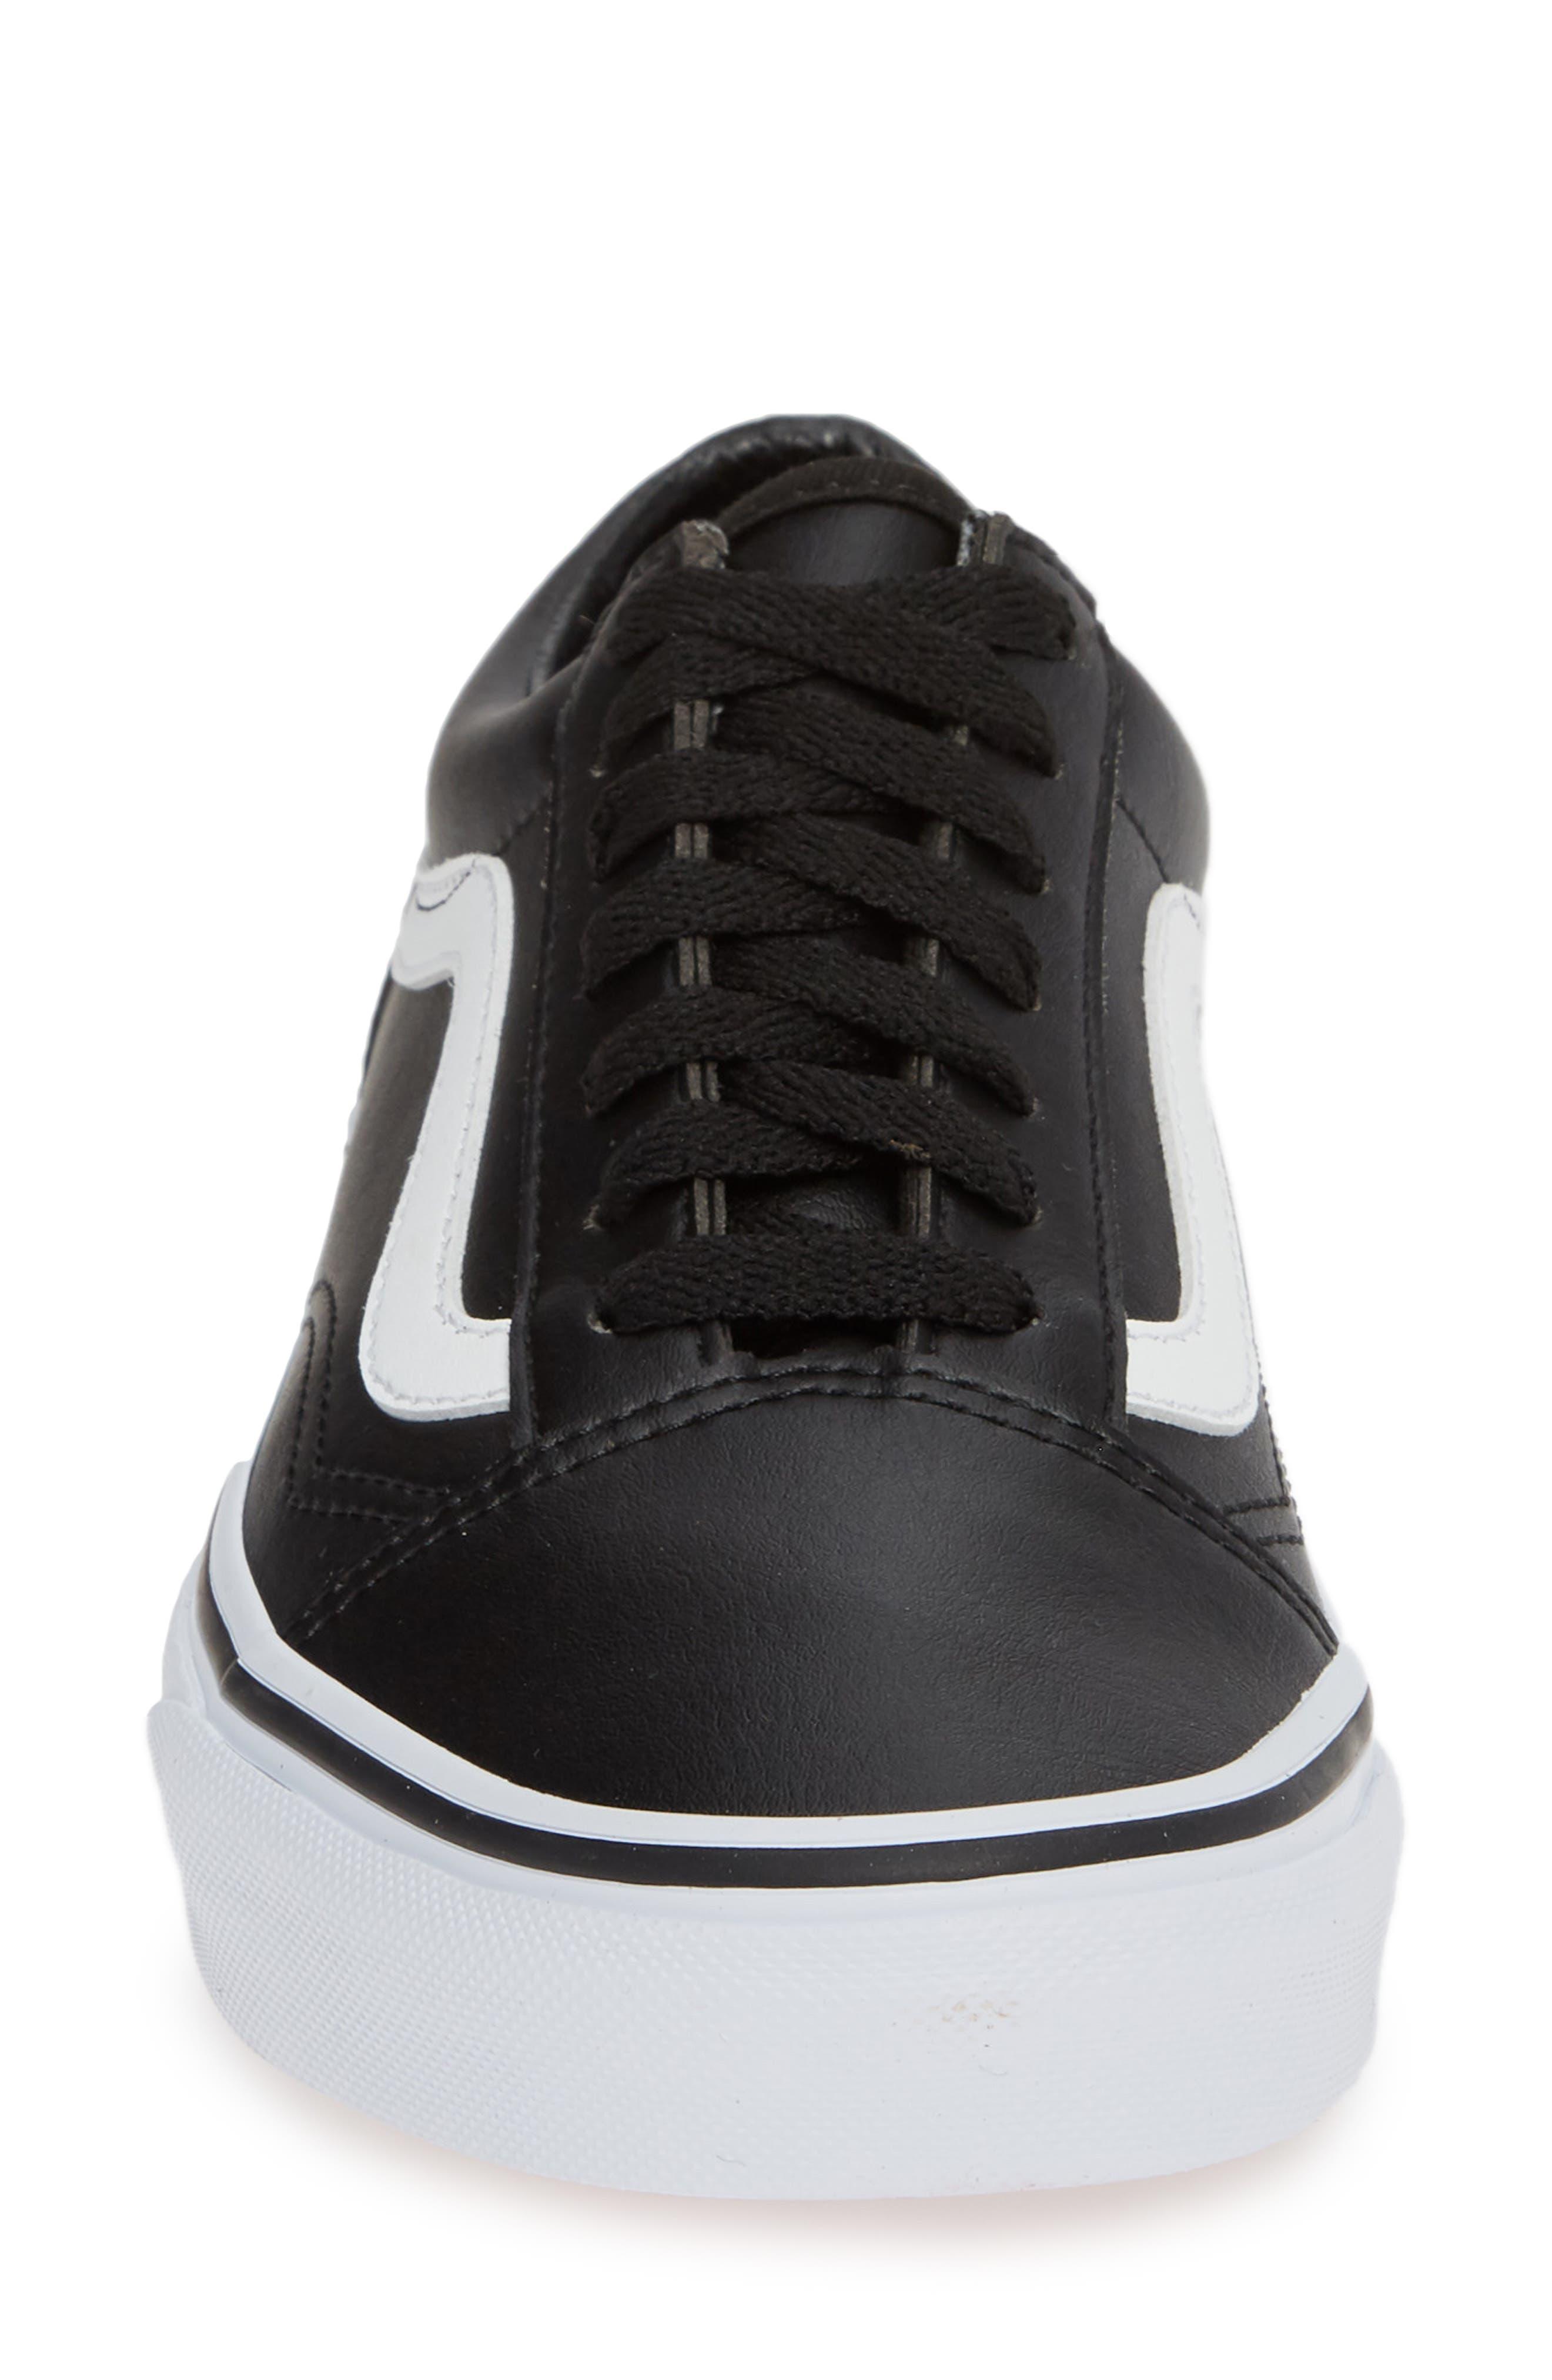 Old Skool Tumble Sneaker,                             Alternate thumbnail 4, color,                             BLACK/ TRUE WHITE